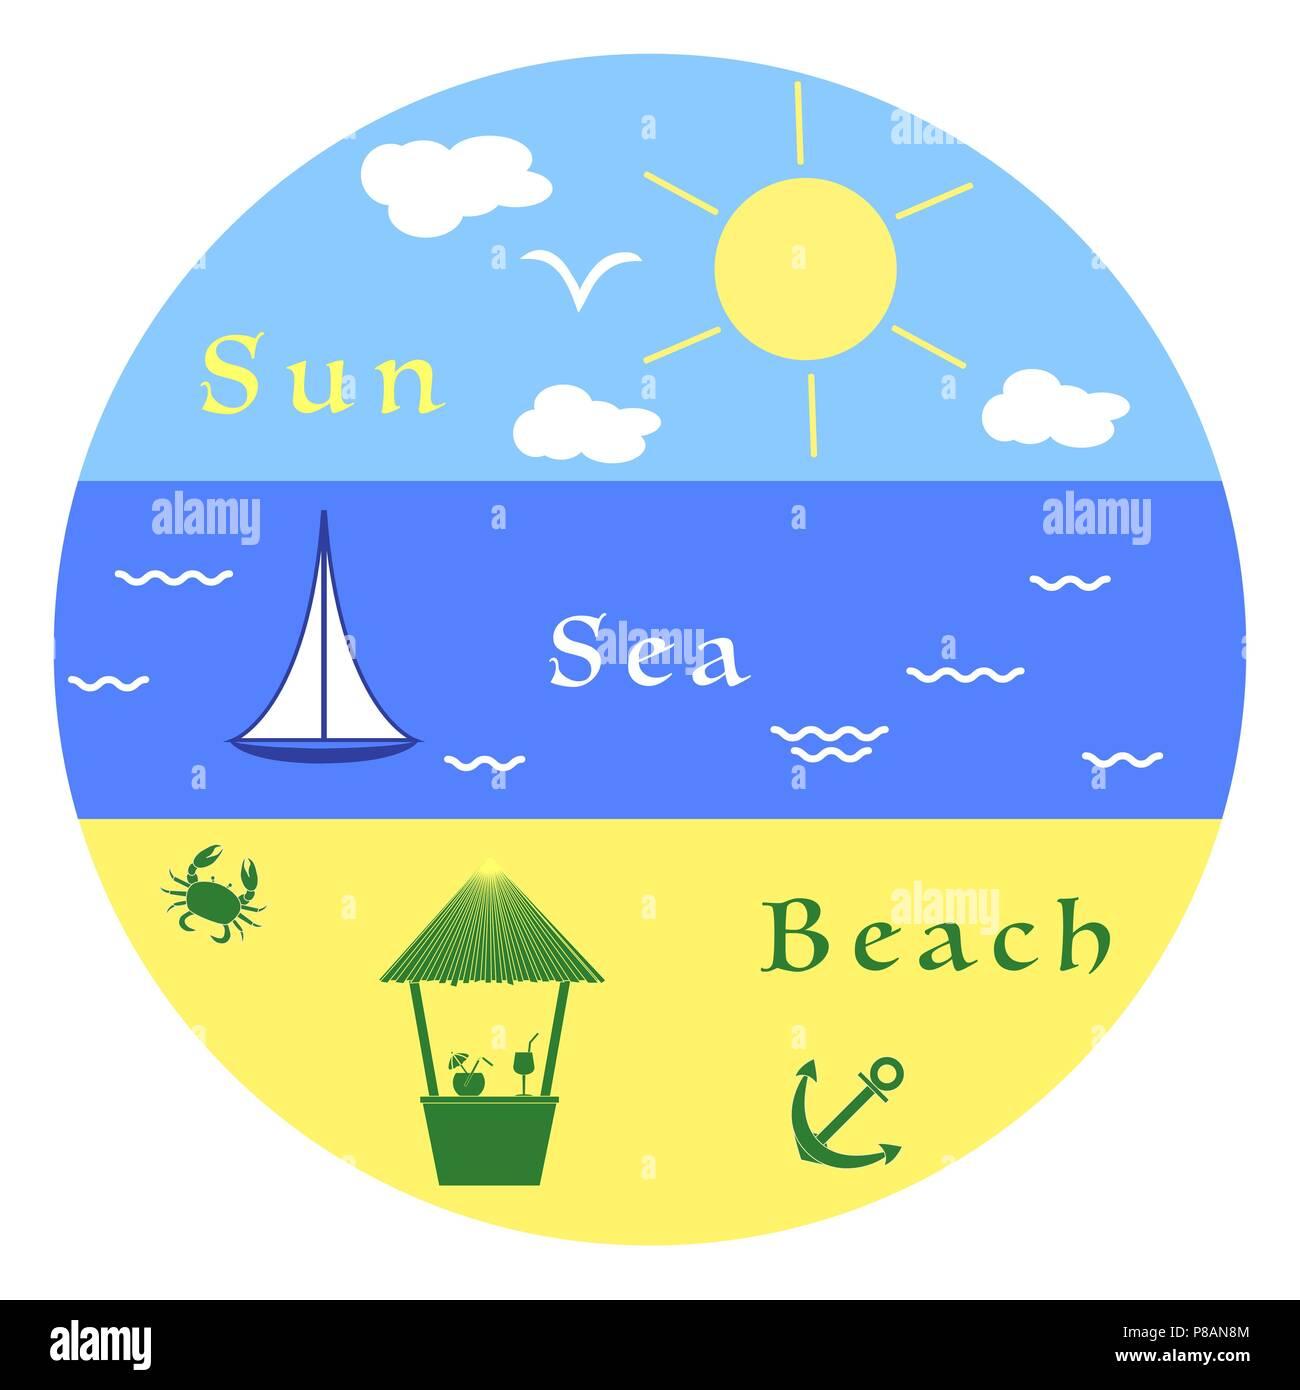 Sun, clouds, bird, sea, waves, yacht, beach, crab, anchor, bar. Summer leisure. - Stock Image